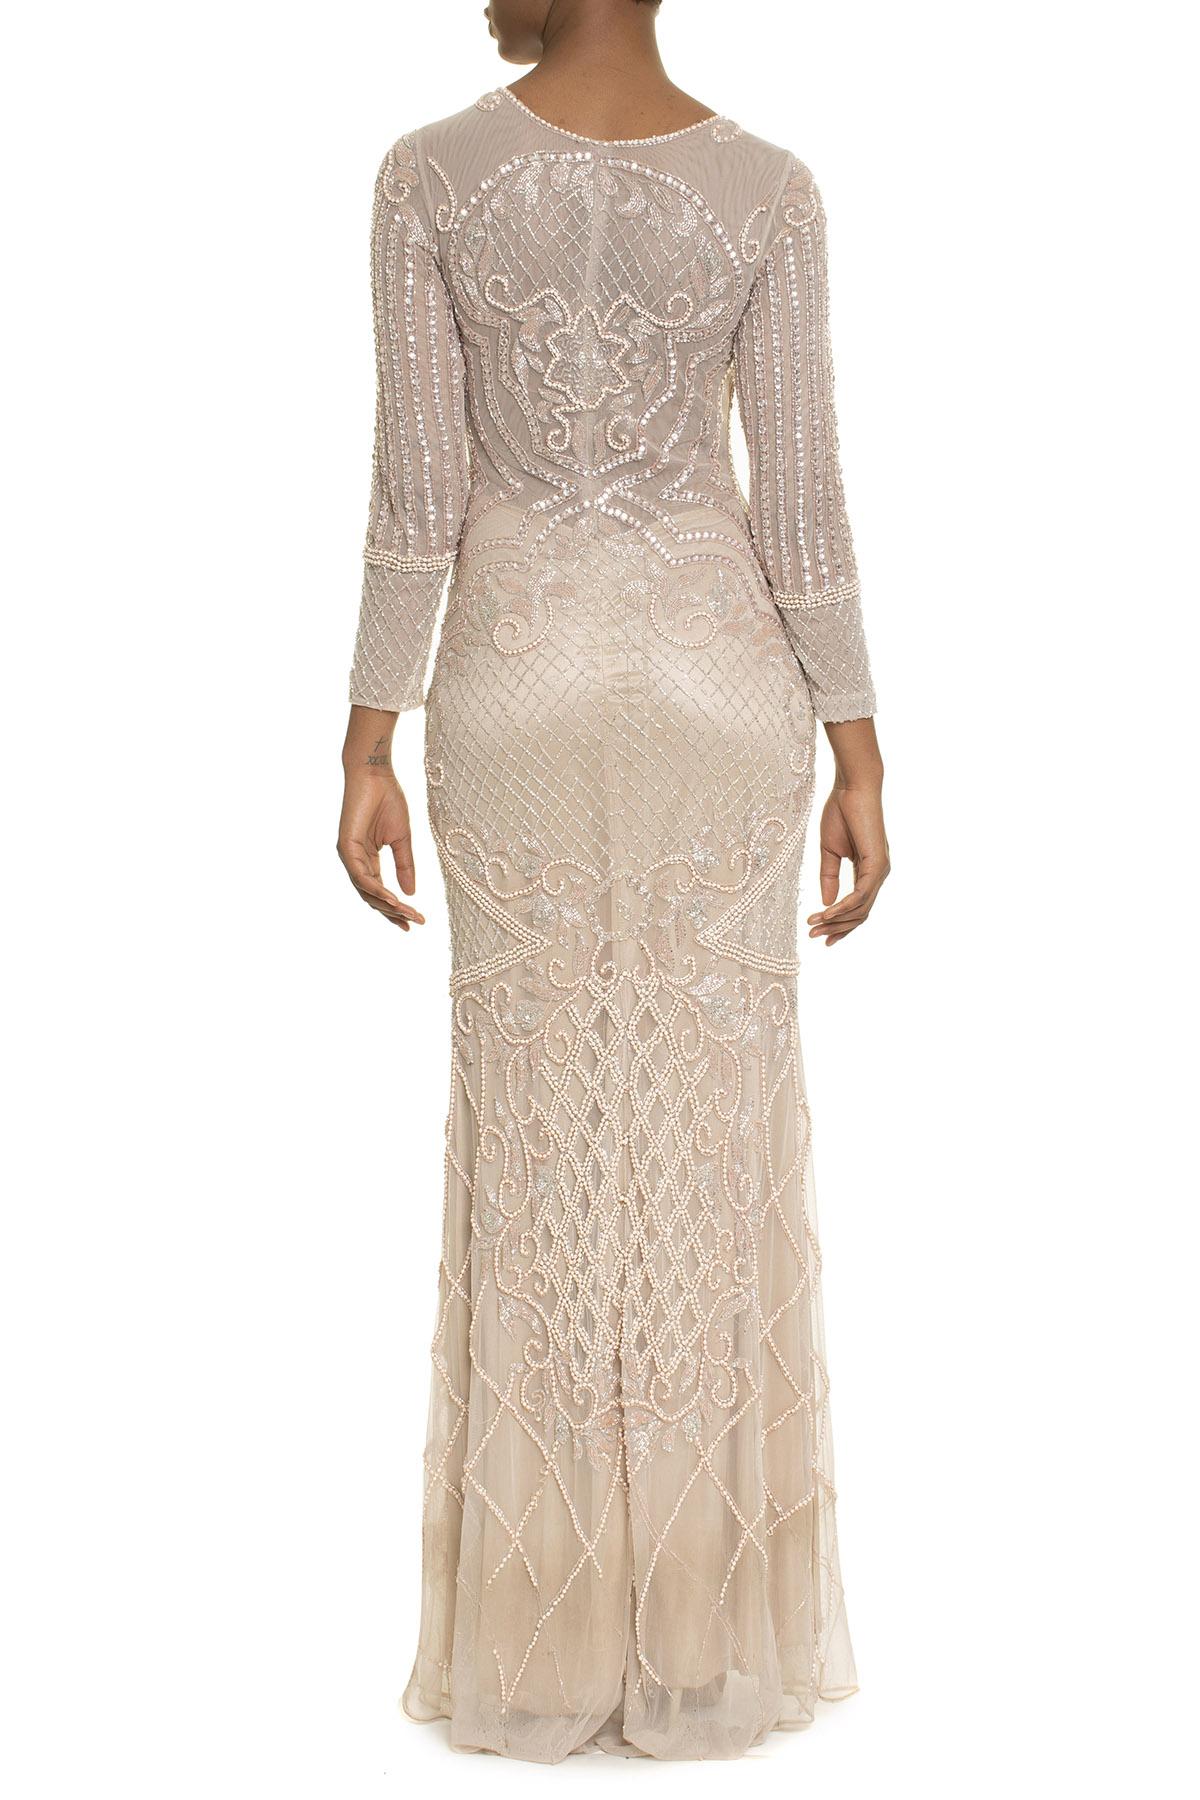 Vestido Sirca Prime Collection